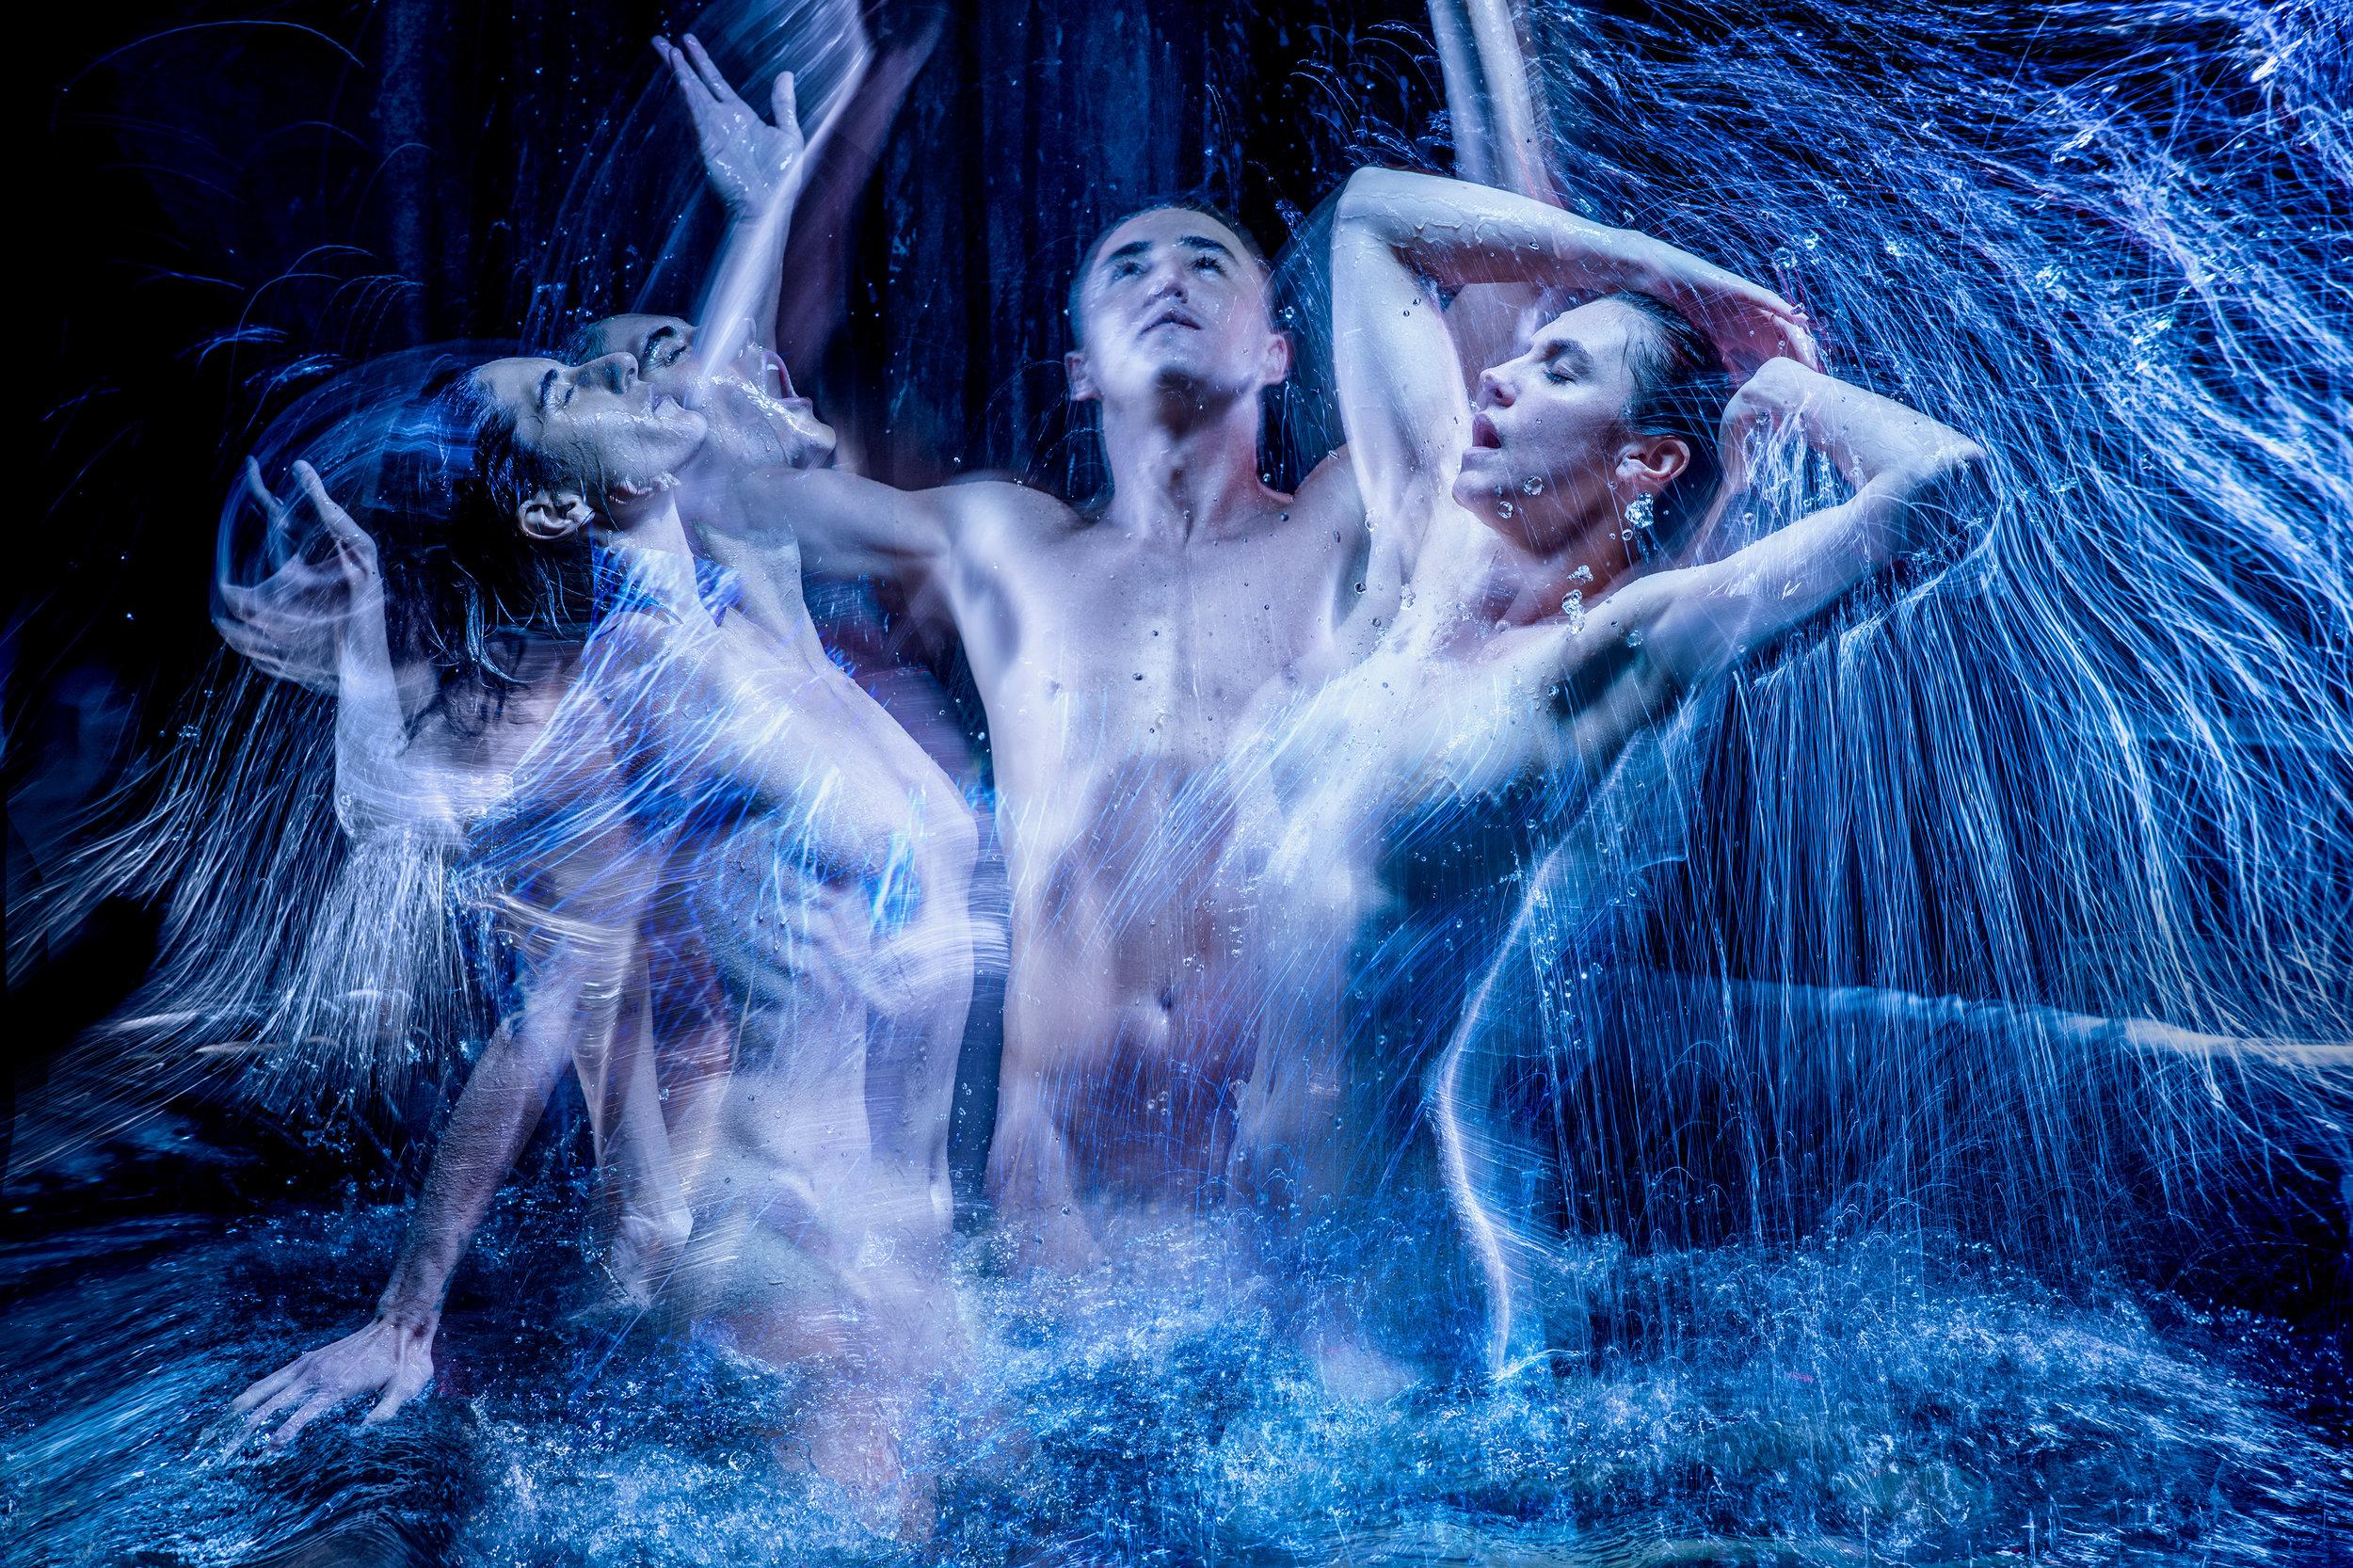 Diana Popovska, Ben Gerrard & Hannah Raven in Metamorphoses by Mary Zimmerman. Copyright John Marmaras 2018.